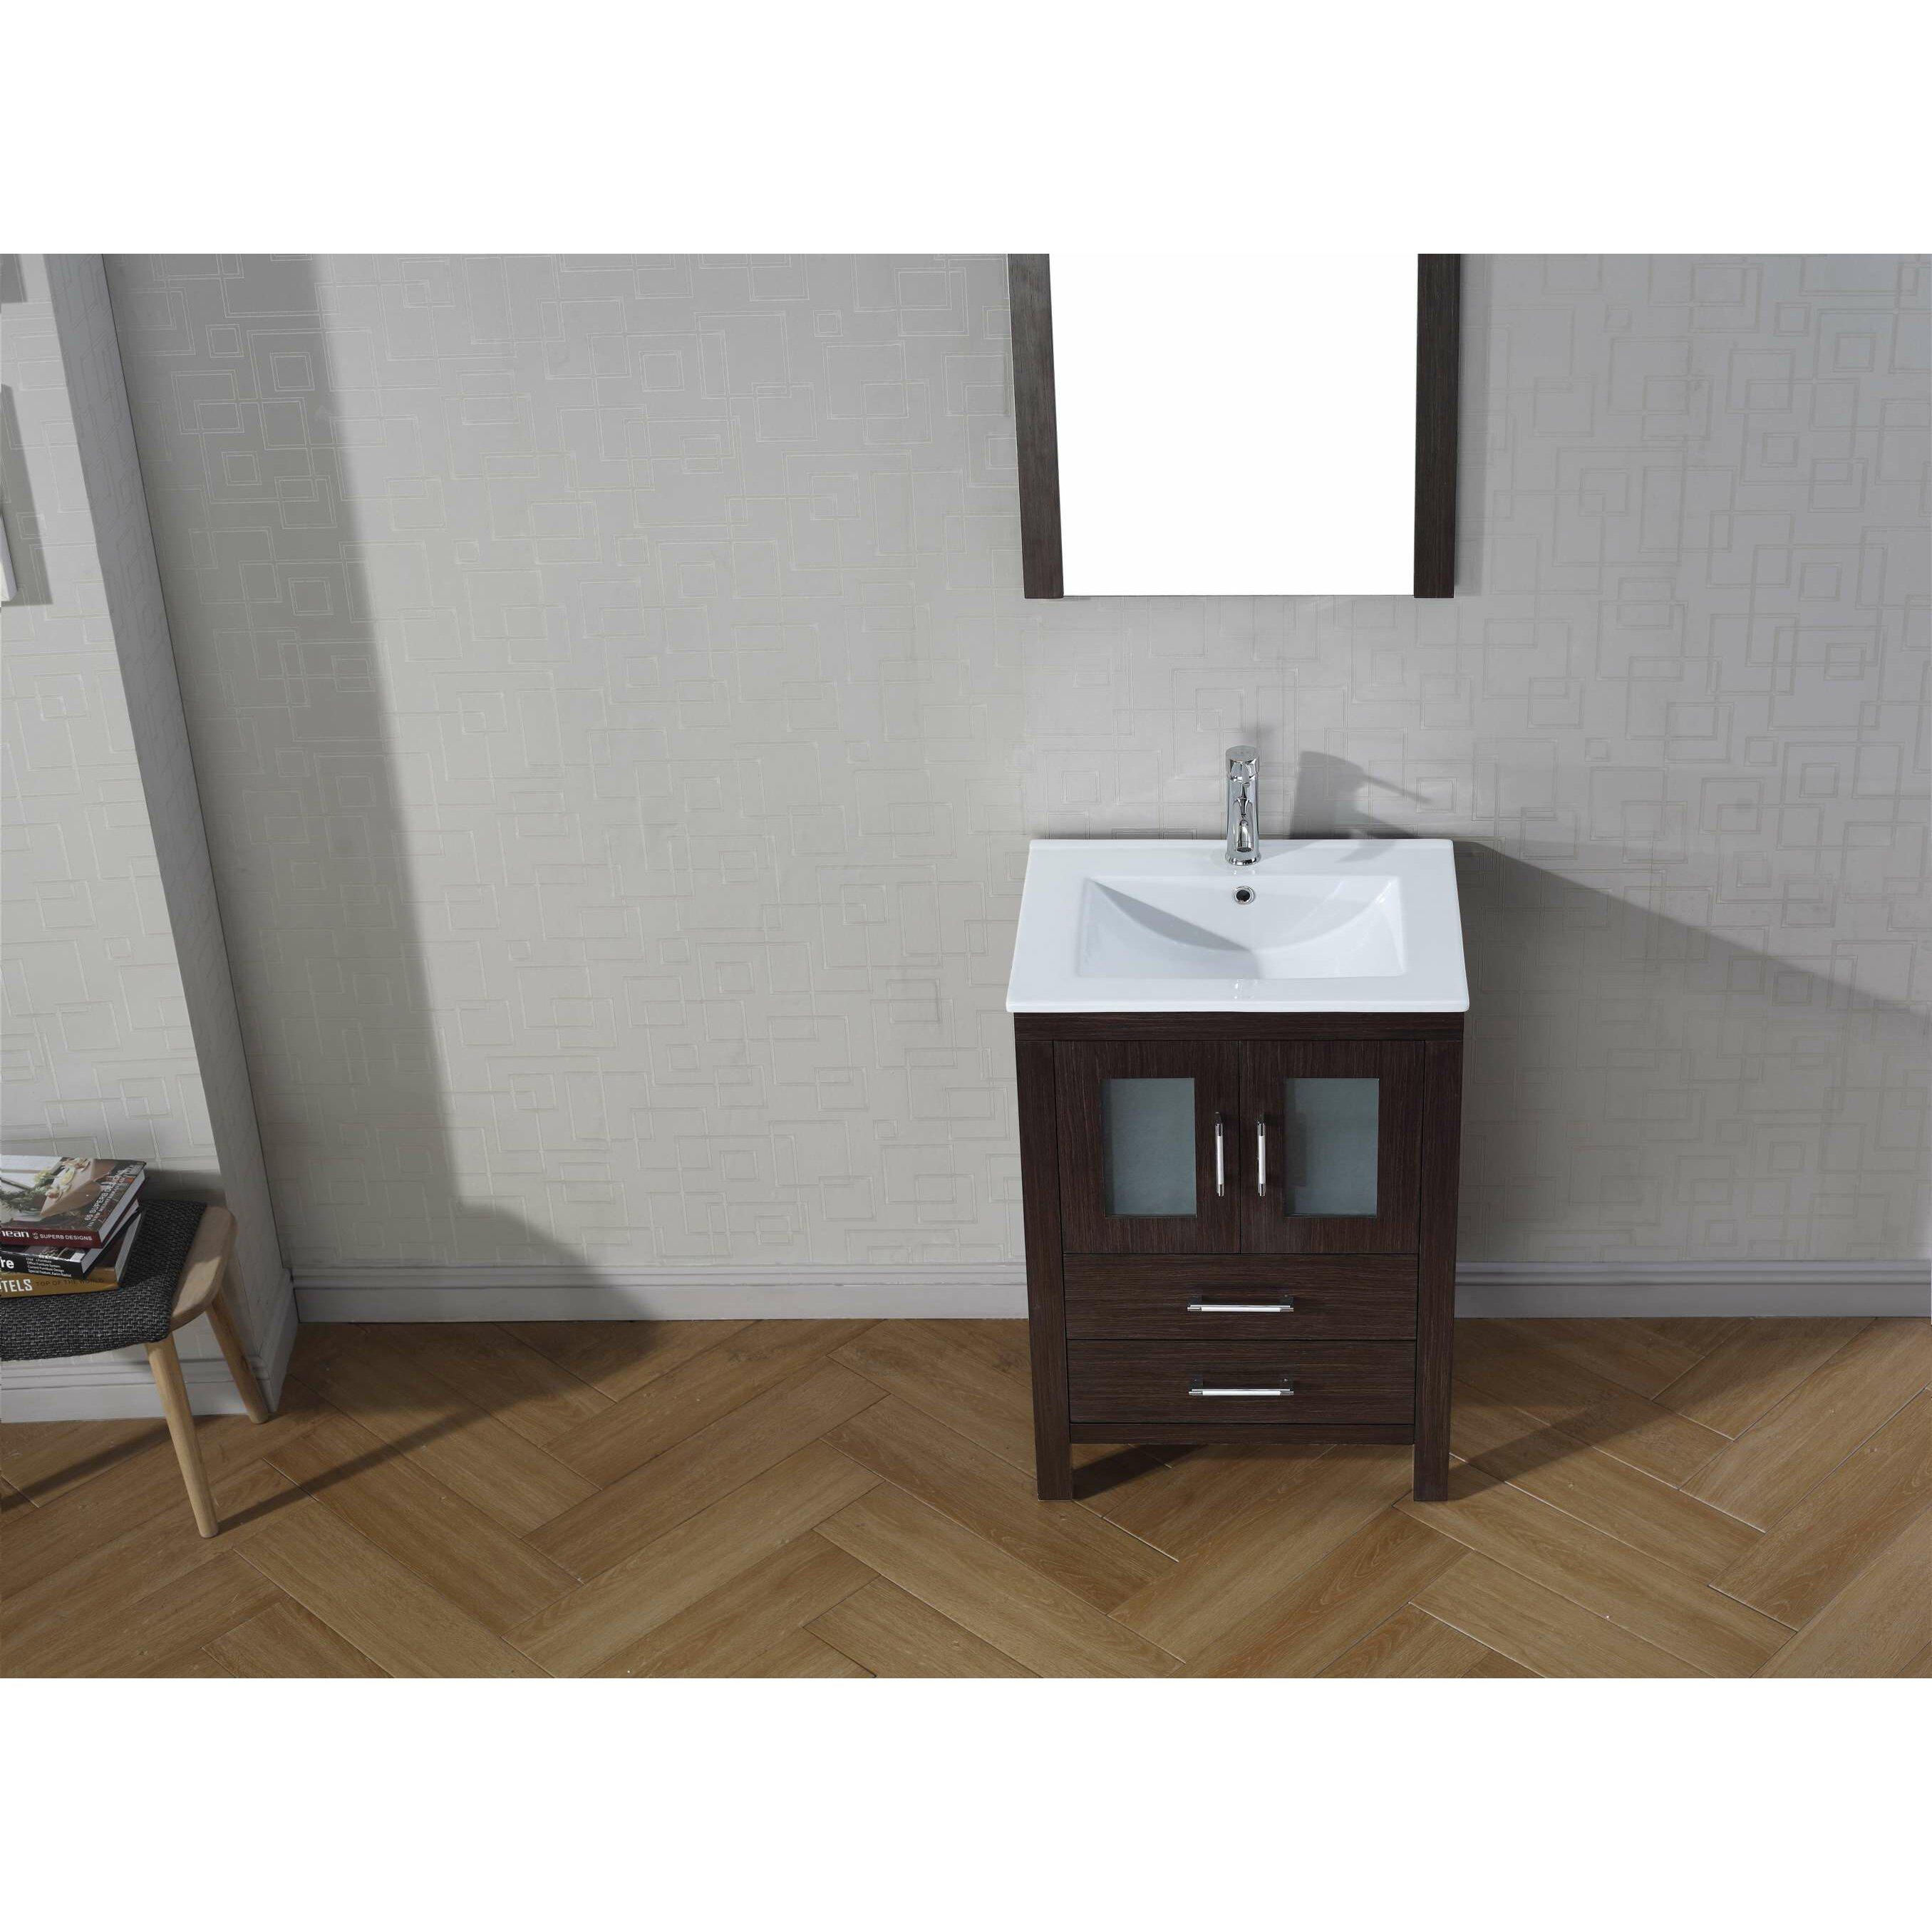 Virtu Dior 23 5 quot  Single Bathroom Vanity Set with White Top and Mirror. Virtu Dior 23 5  Single Bathroom Vanity Set with White Top and